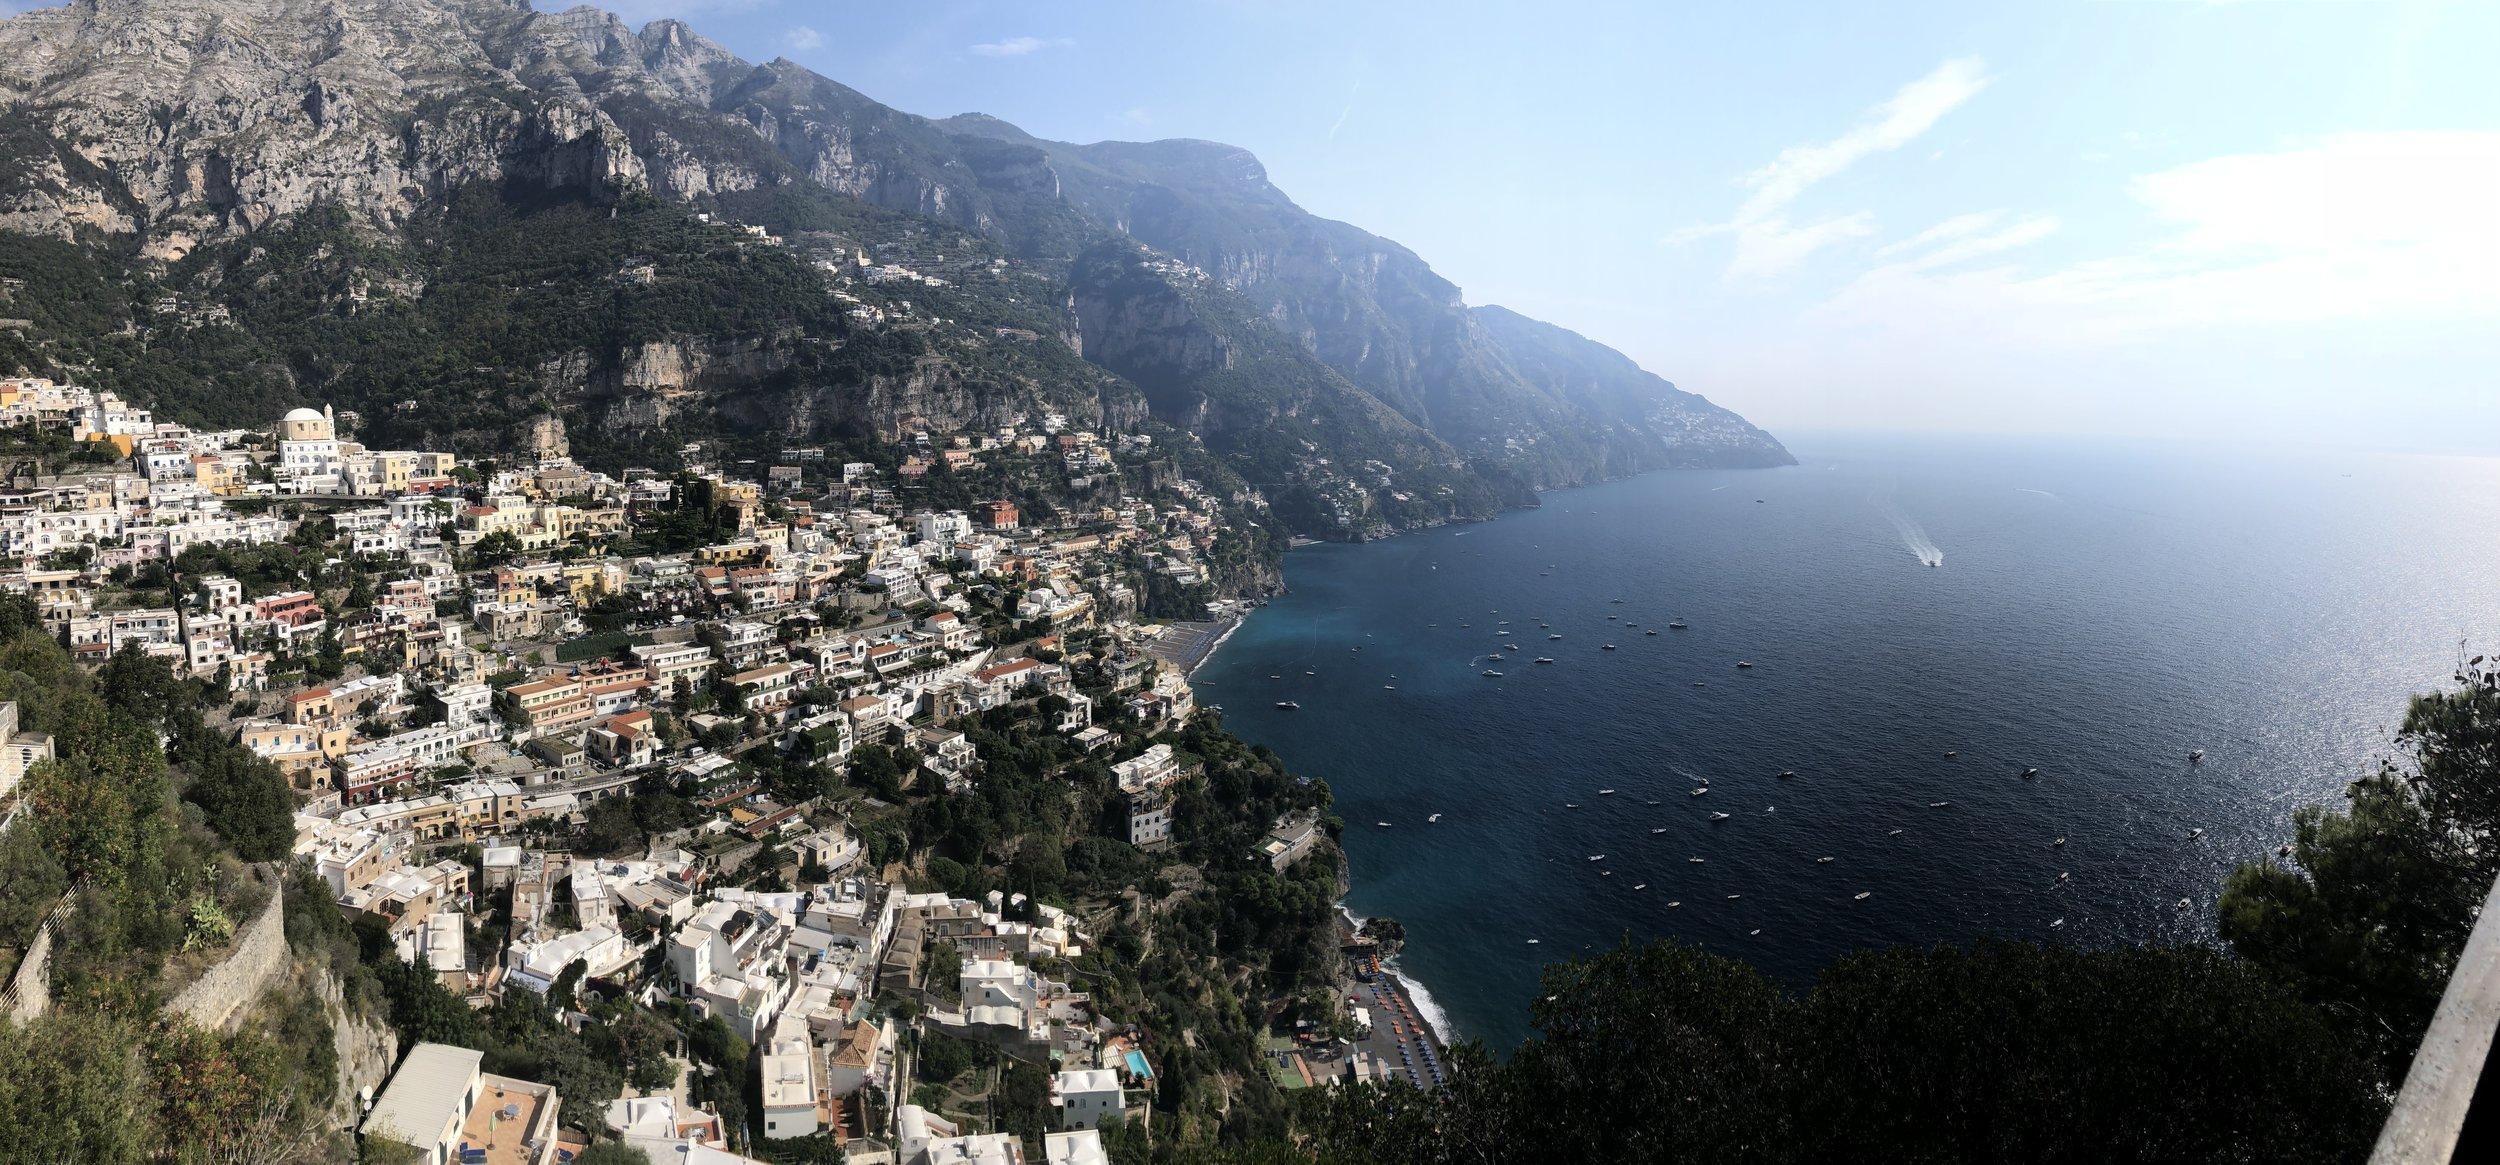 The drive along Amalfi Coast. —Photo taken: October 12, 2018